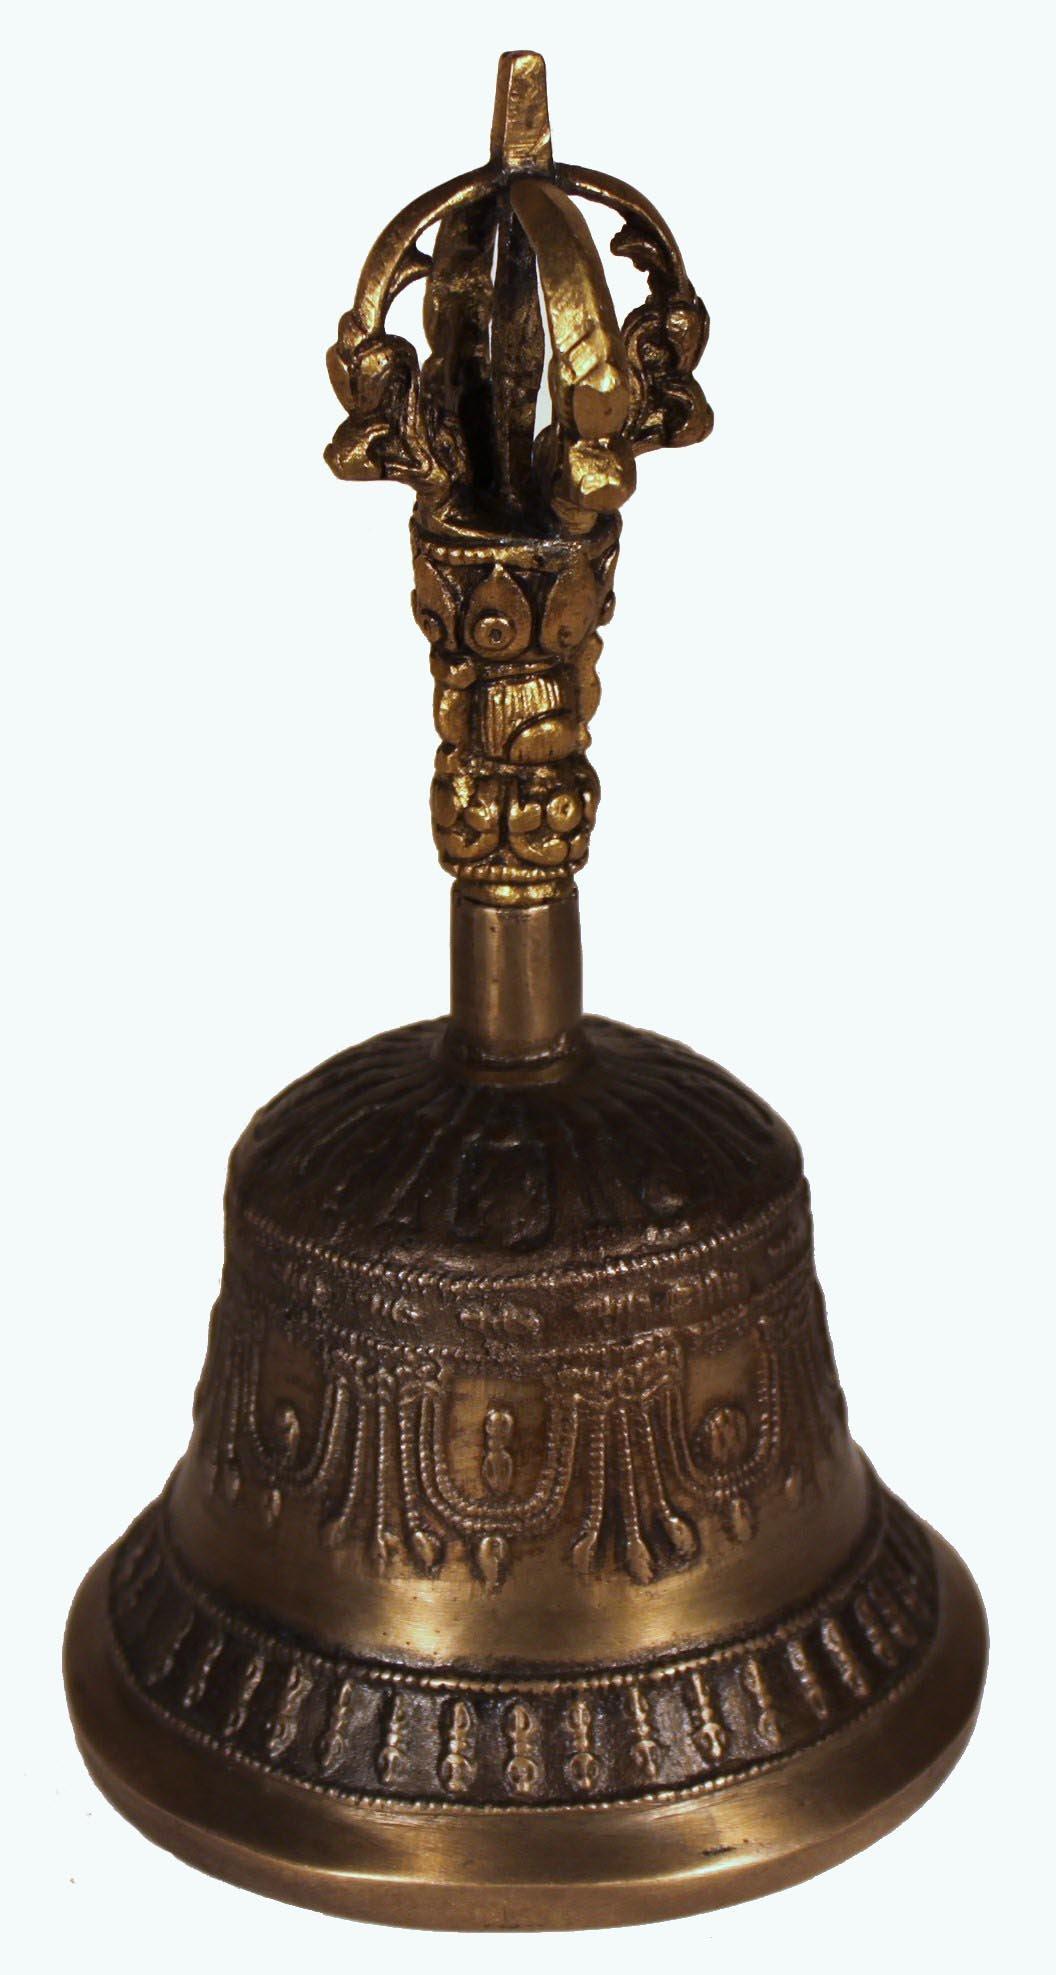 Antique Bell / Tibetan Meditation Bell / Tibetan / Multi-Layered Harmonics / Meditation Tool by Tibetan (Image #4)